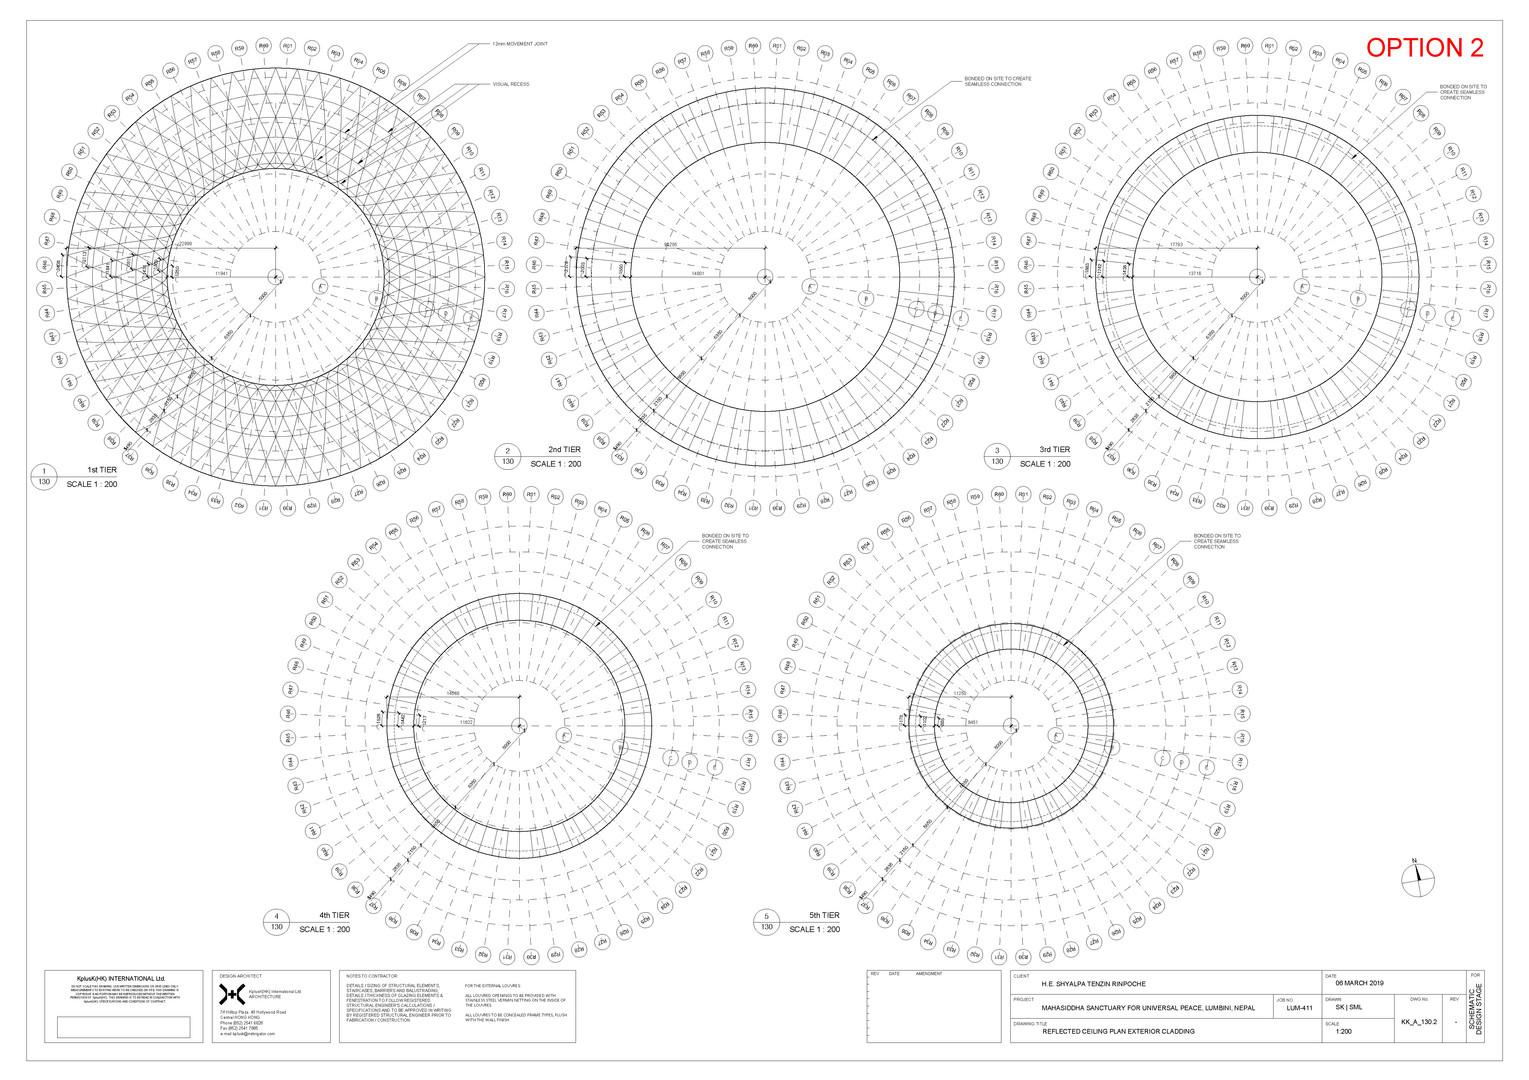 KK_A_130.2 Reflected Ceiling Plan Exteri